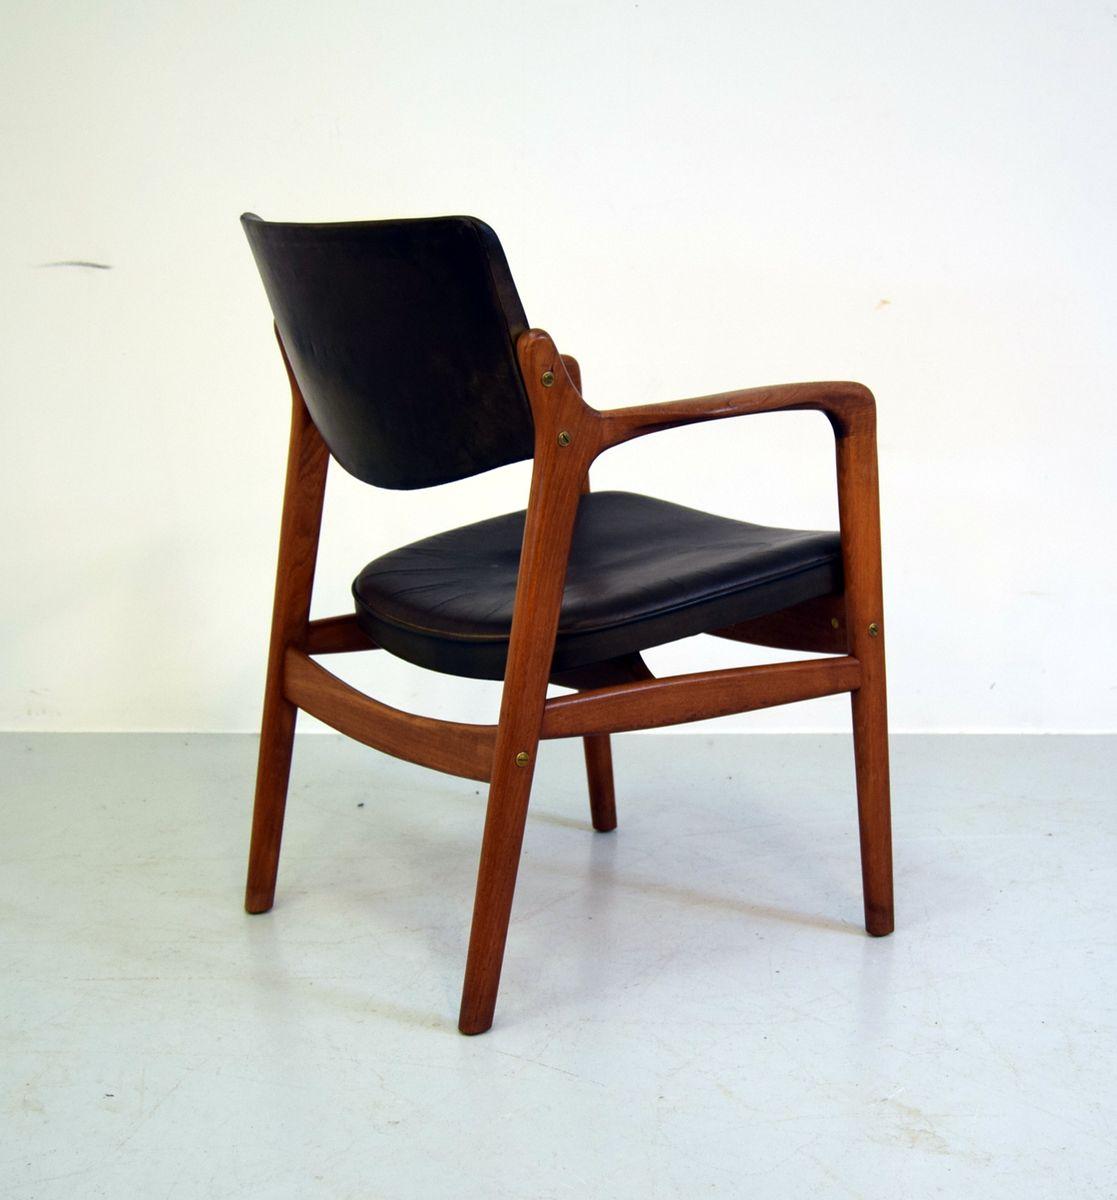 ideas century office on vouumcom - mid century office chair by erik kirkegaard for hng stolefabrik